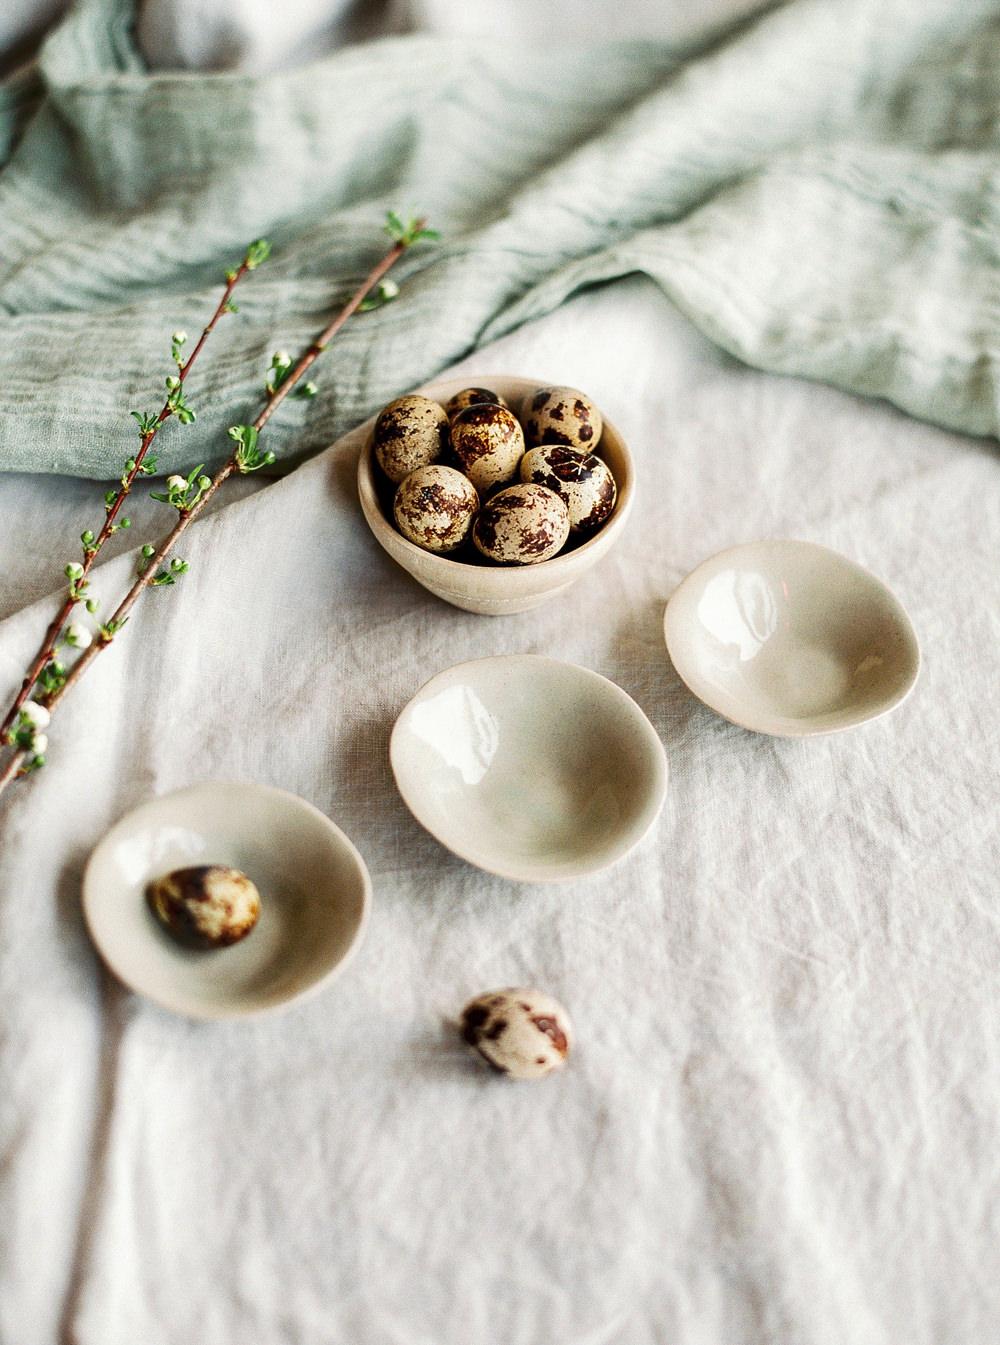 Quails eggs in miniature bowls